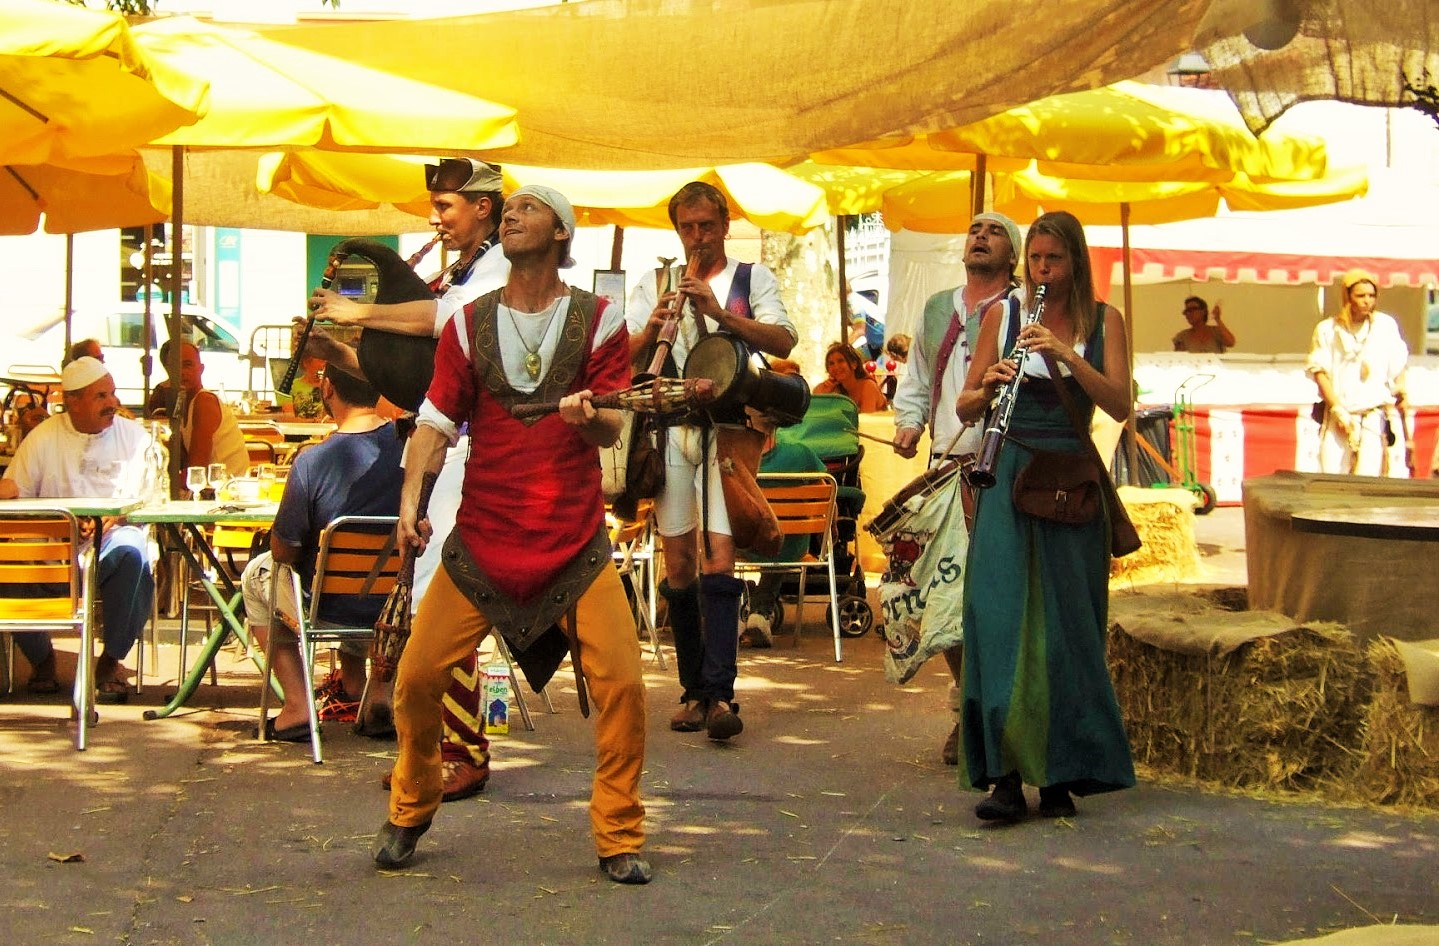 MyFrenchLife™ - MyFrenchLife.org - Jan Leishman - Var medieval festival - jugglers